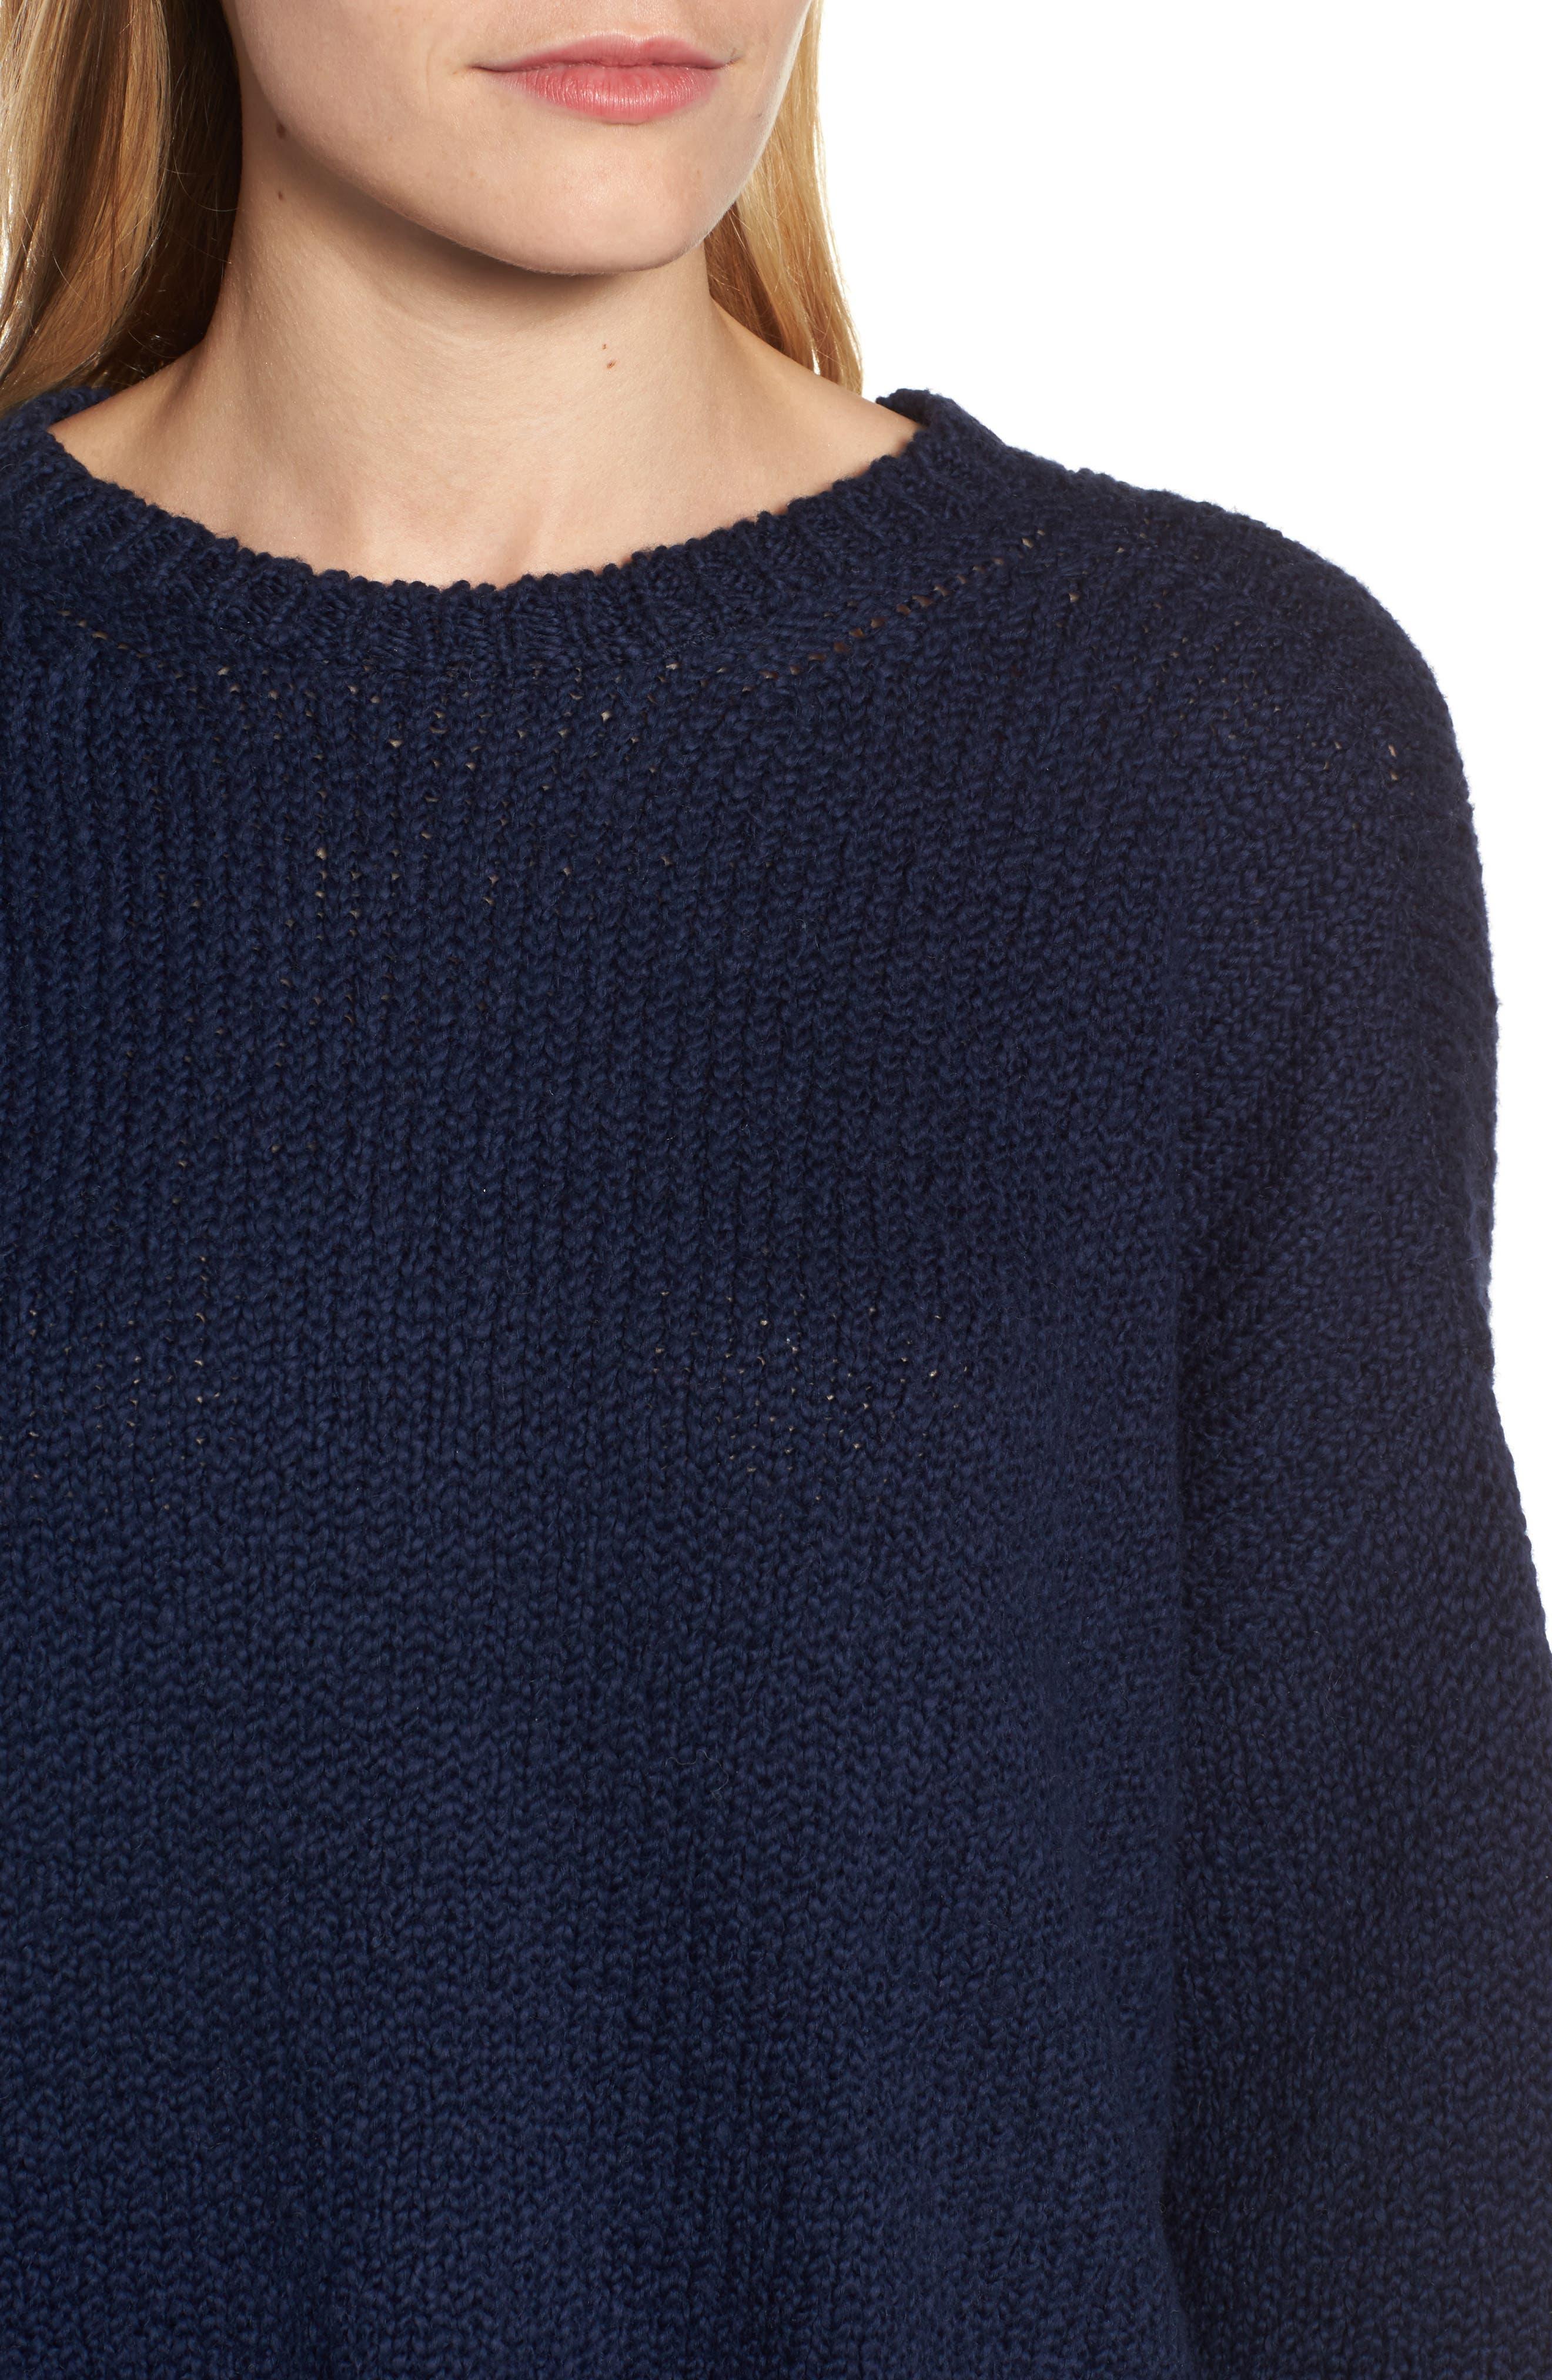 Organic Cotton Crewneck Sweater,                             Alternate thumbnail 4, color,                             Midnight